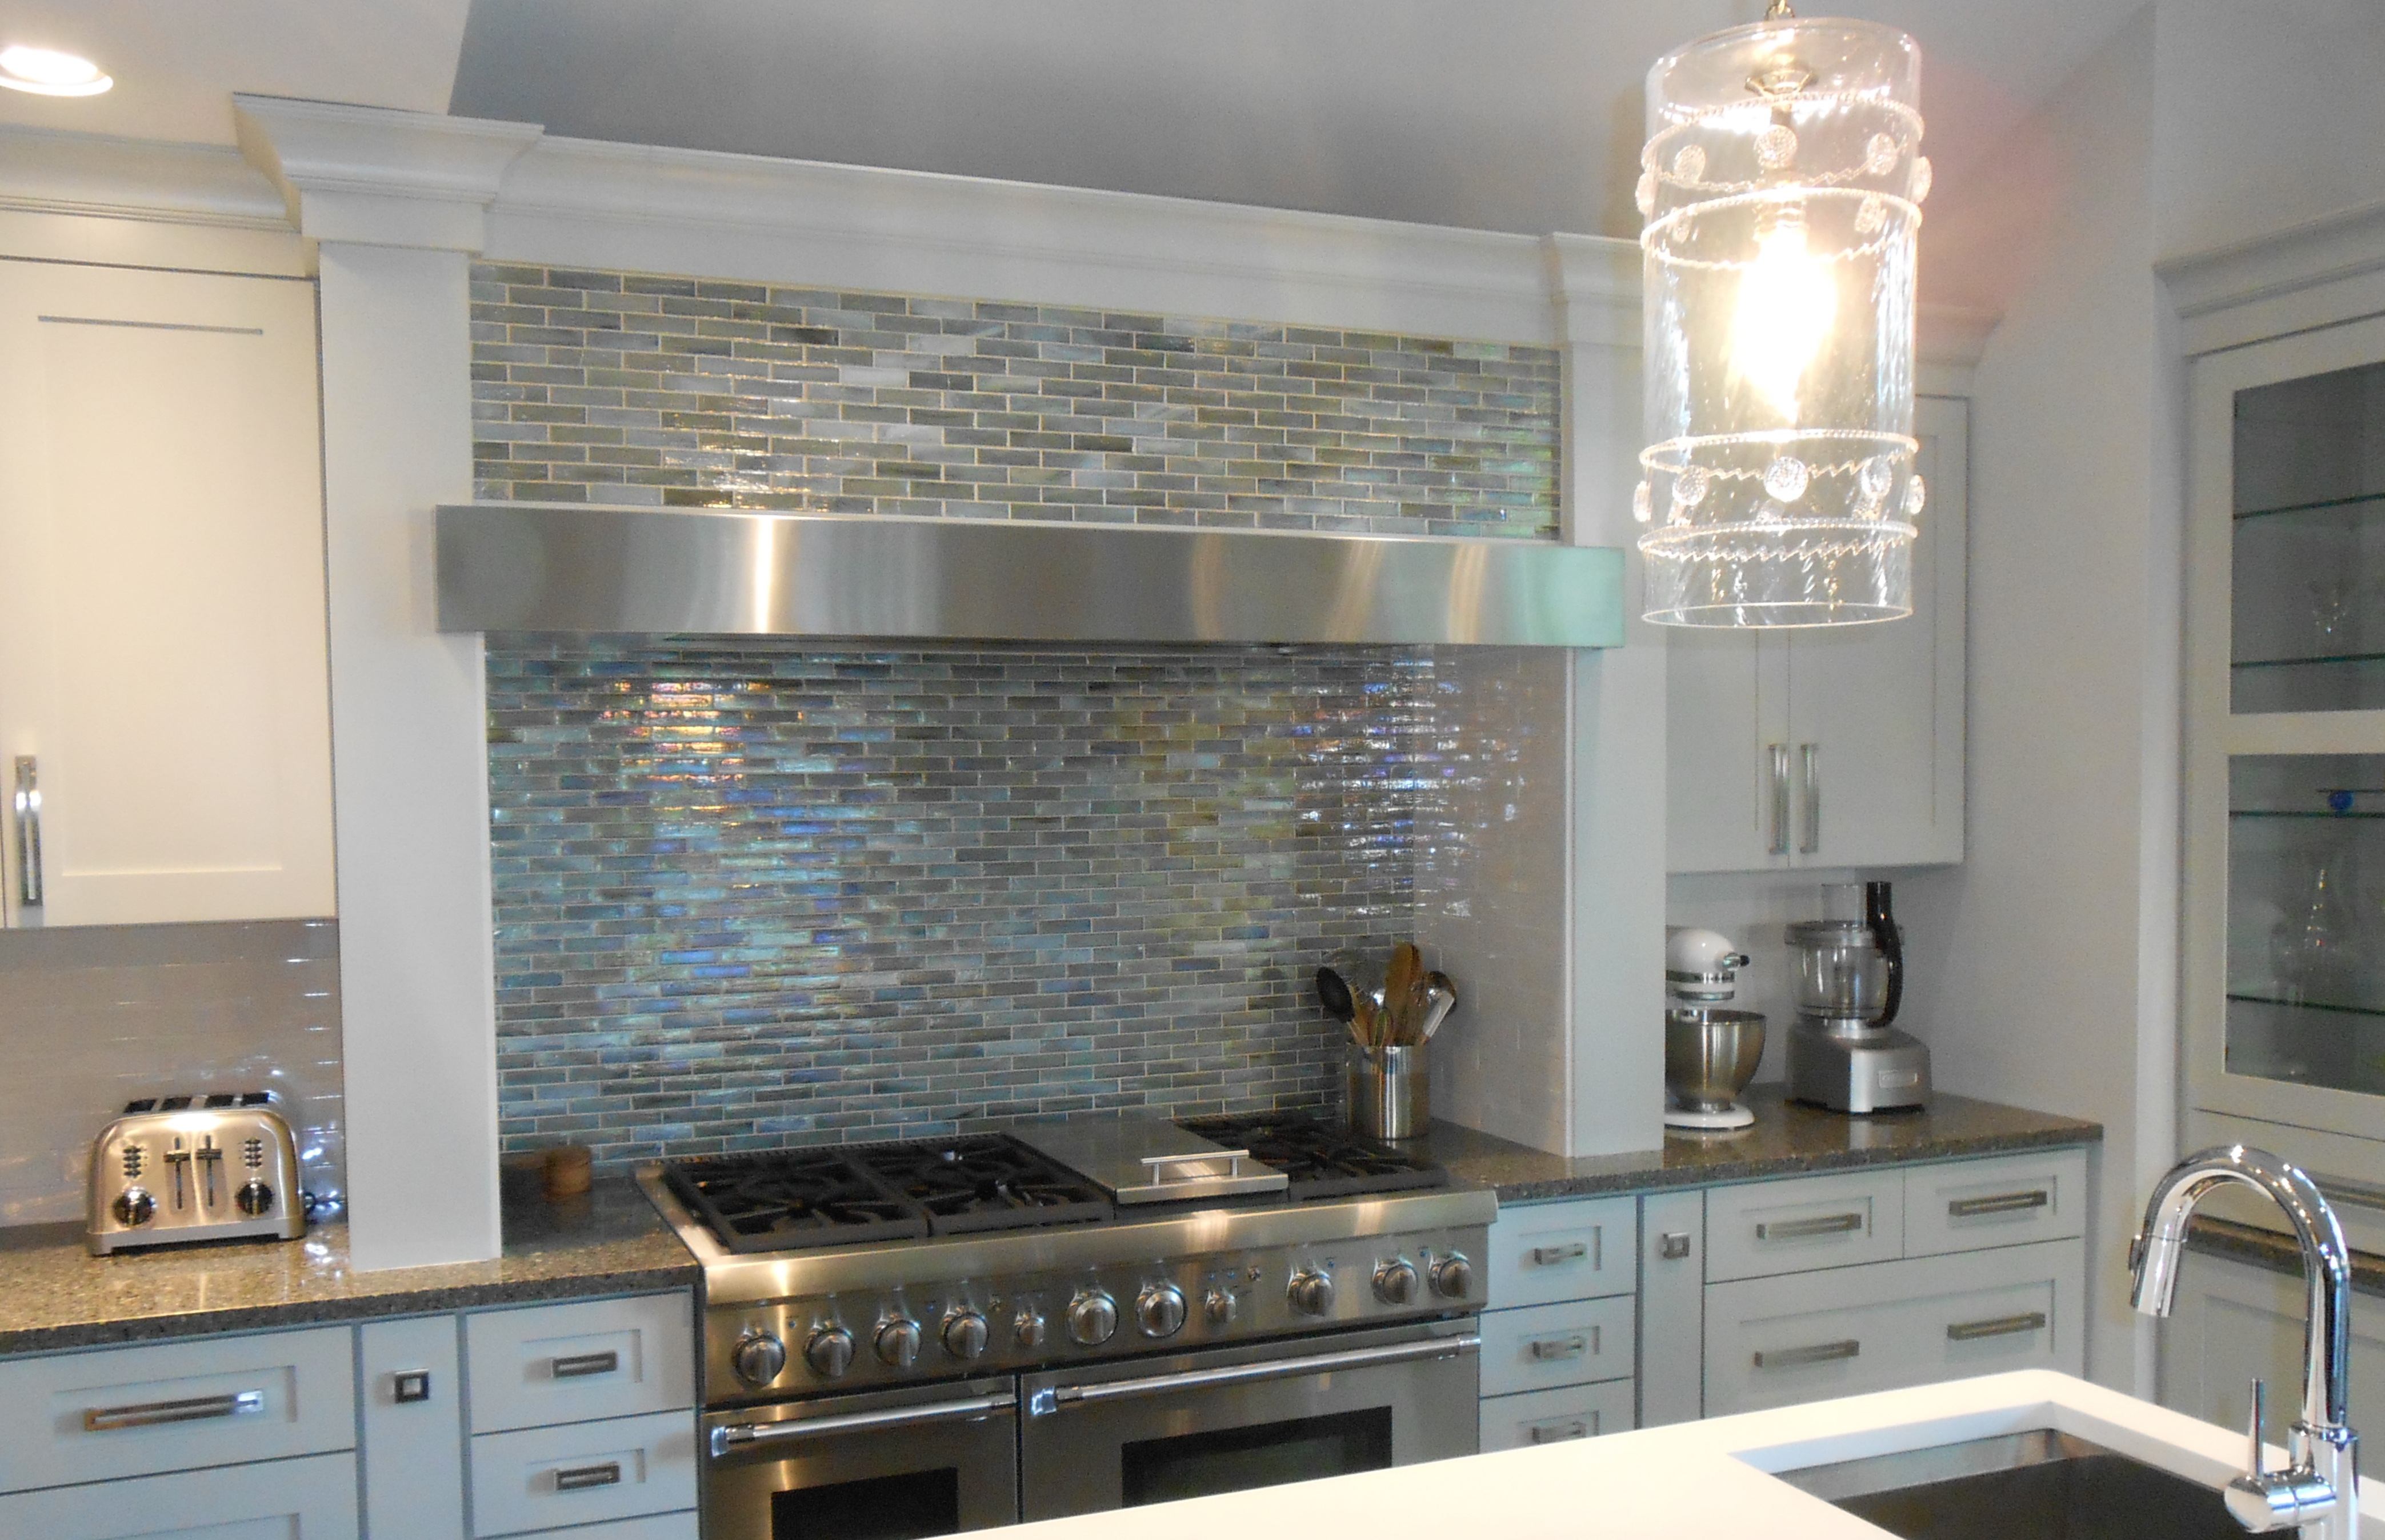 Houzz kitchen backsplashes top kitchen trends for 2016 glass tile backsplashes by